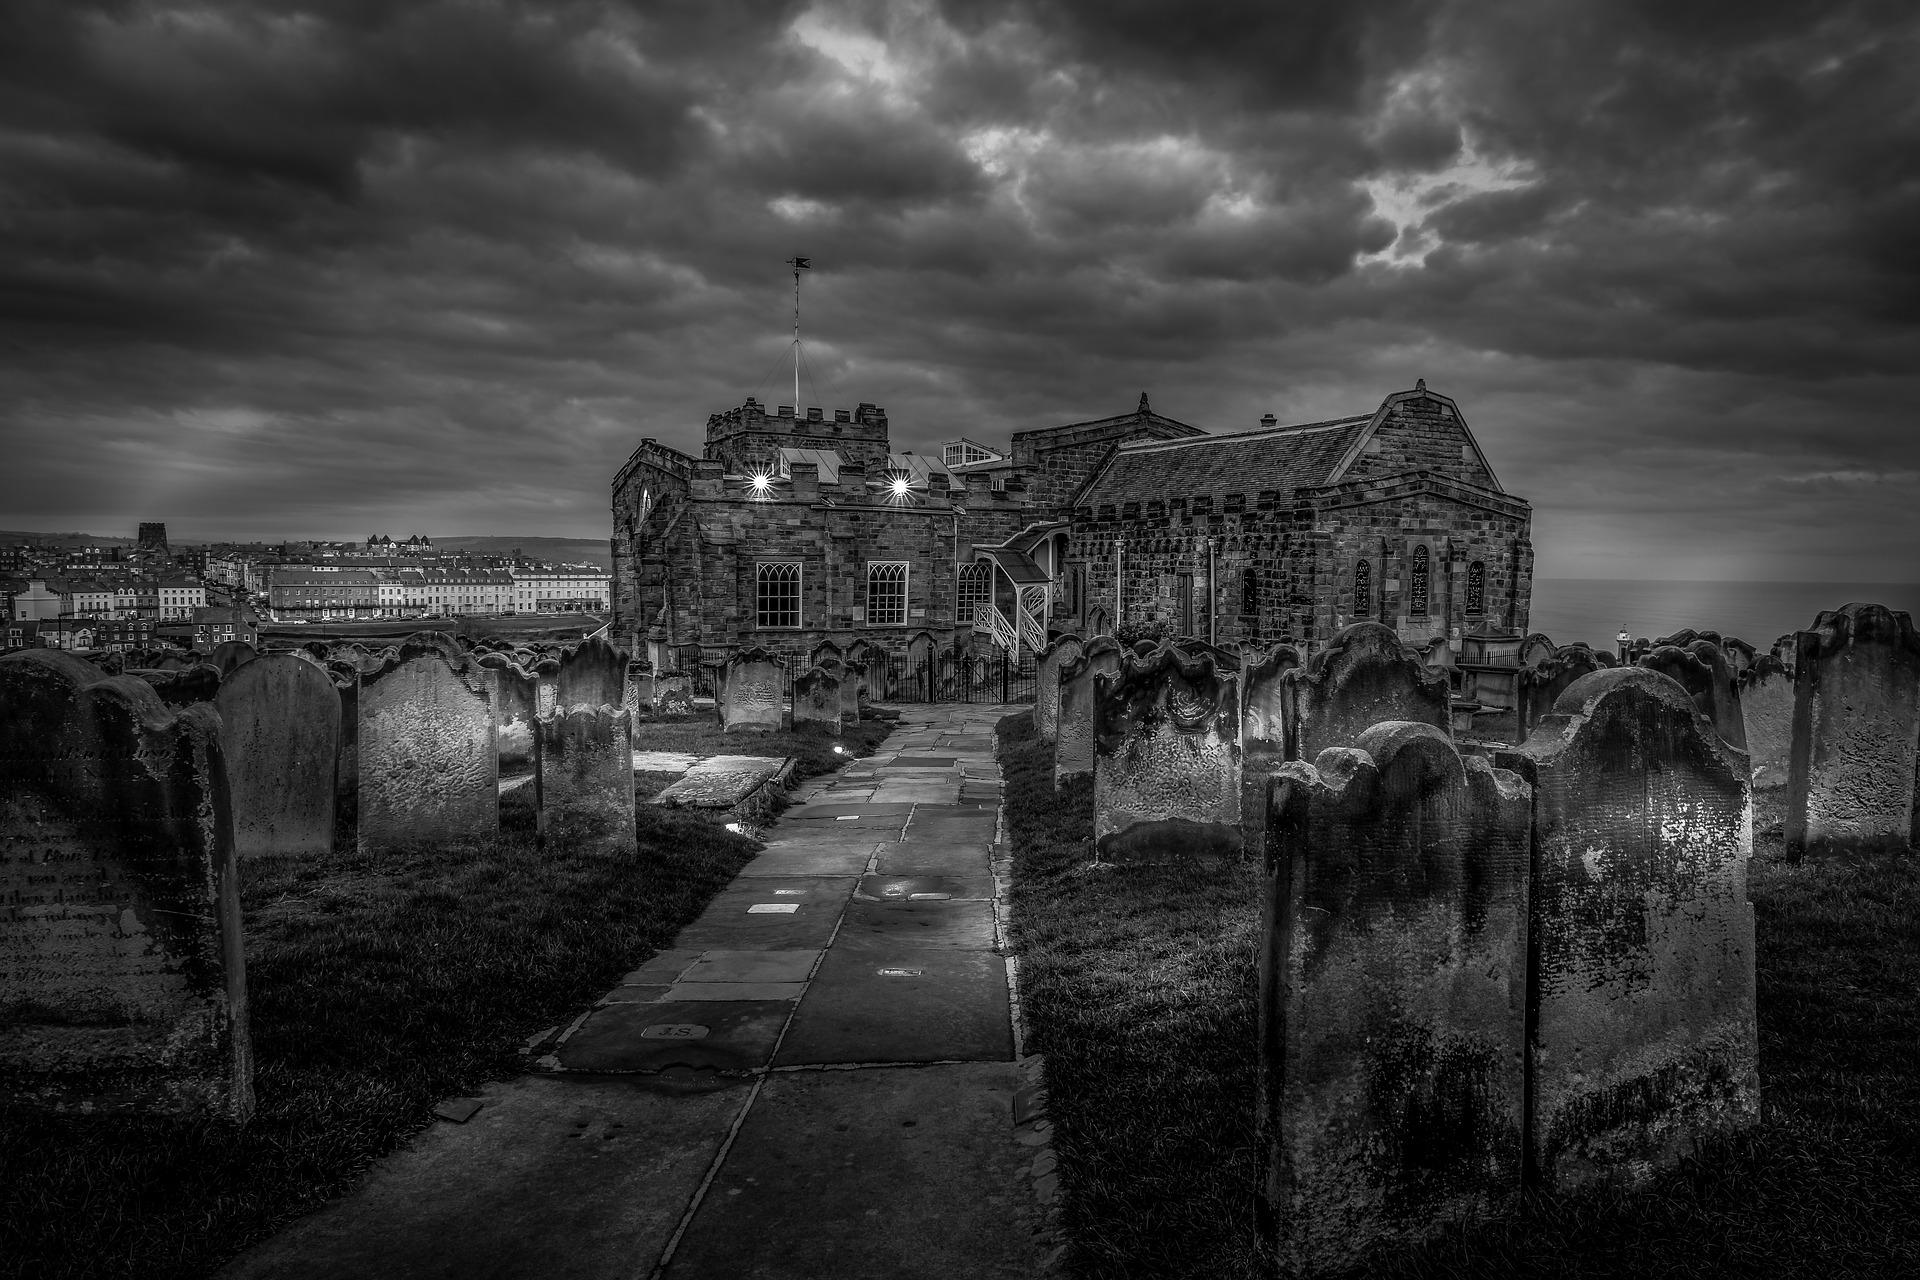 st-marys-church-3790659_1920